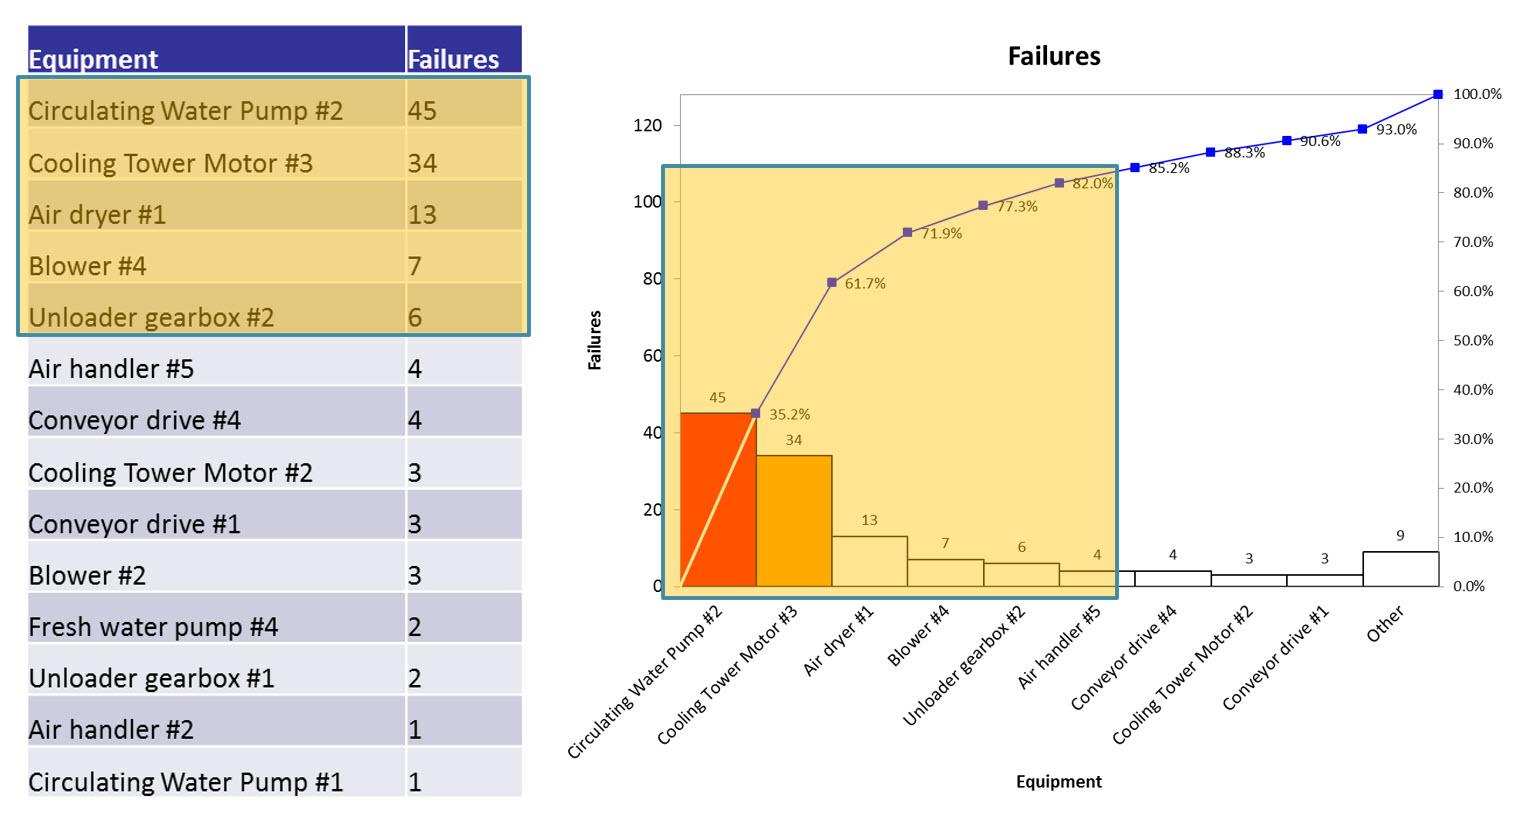 asset criticality ranking and pareto analysis